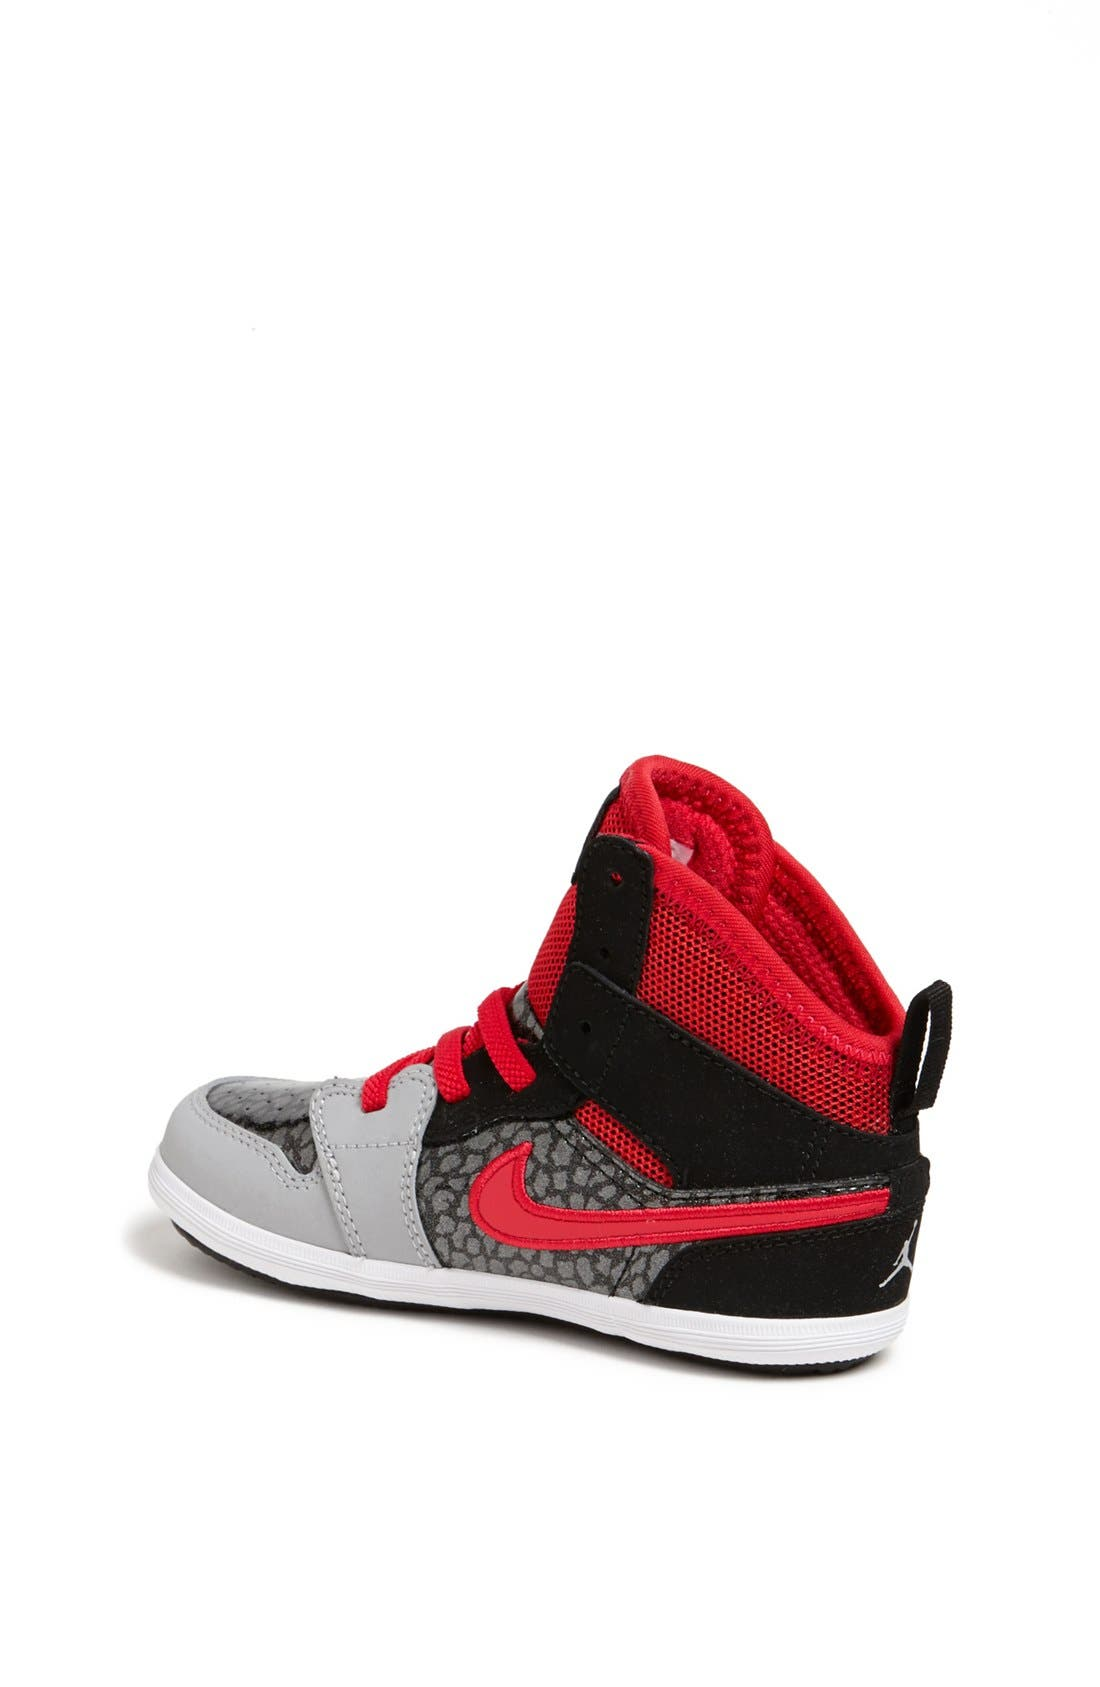 Alternate Image 2  - Nike 'Jordan 1 Skinny High' Sneaker (Baby, Walker & Toddler)